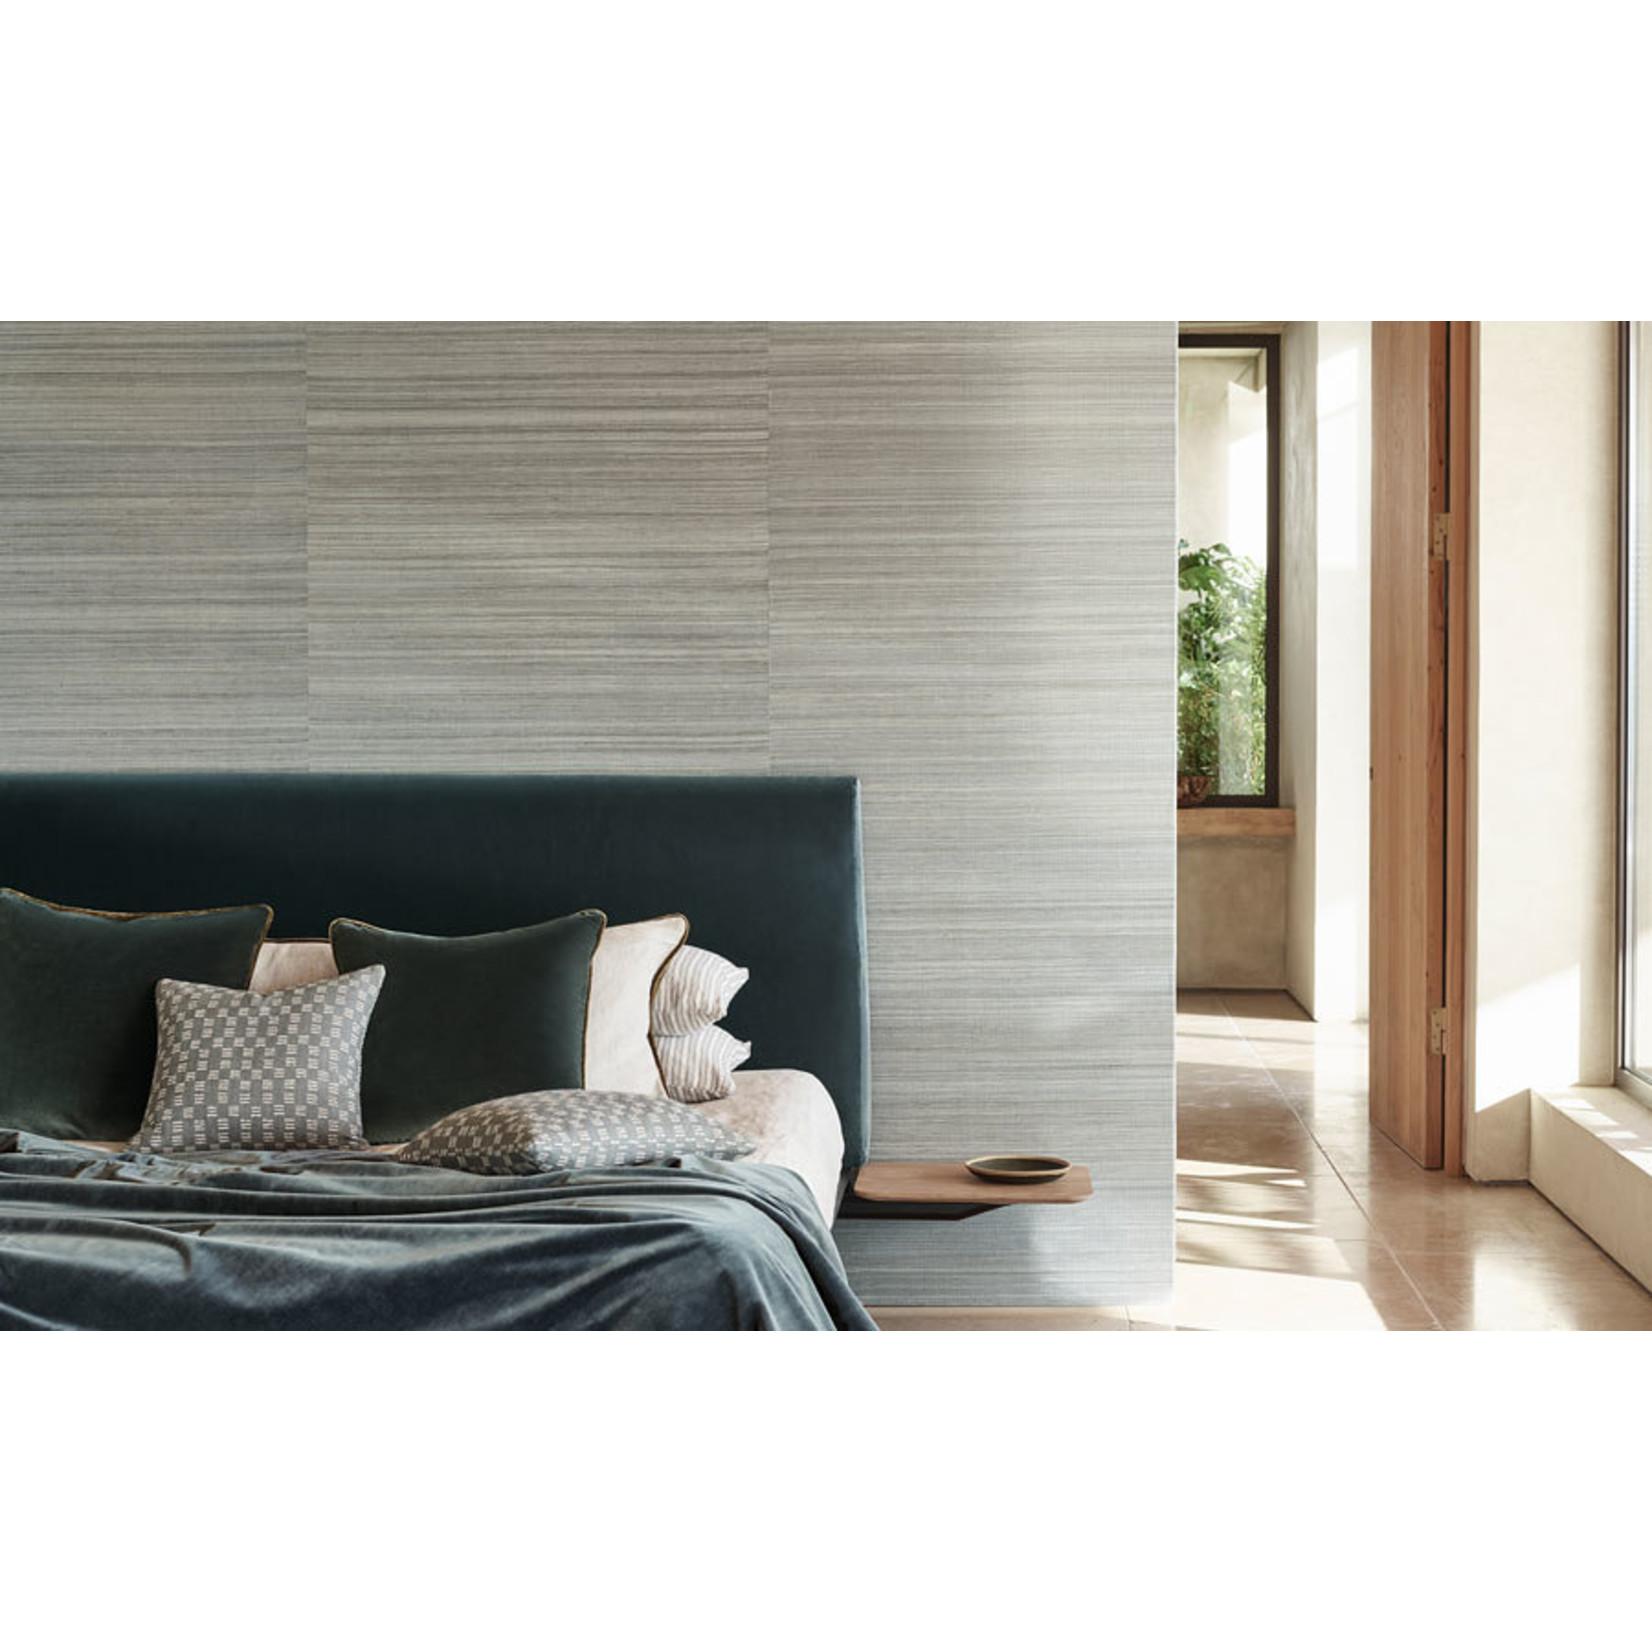 Mark Alexander Grasscloth Handwoven Wallcoverings | Duo Sisal Calcite